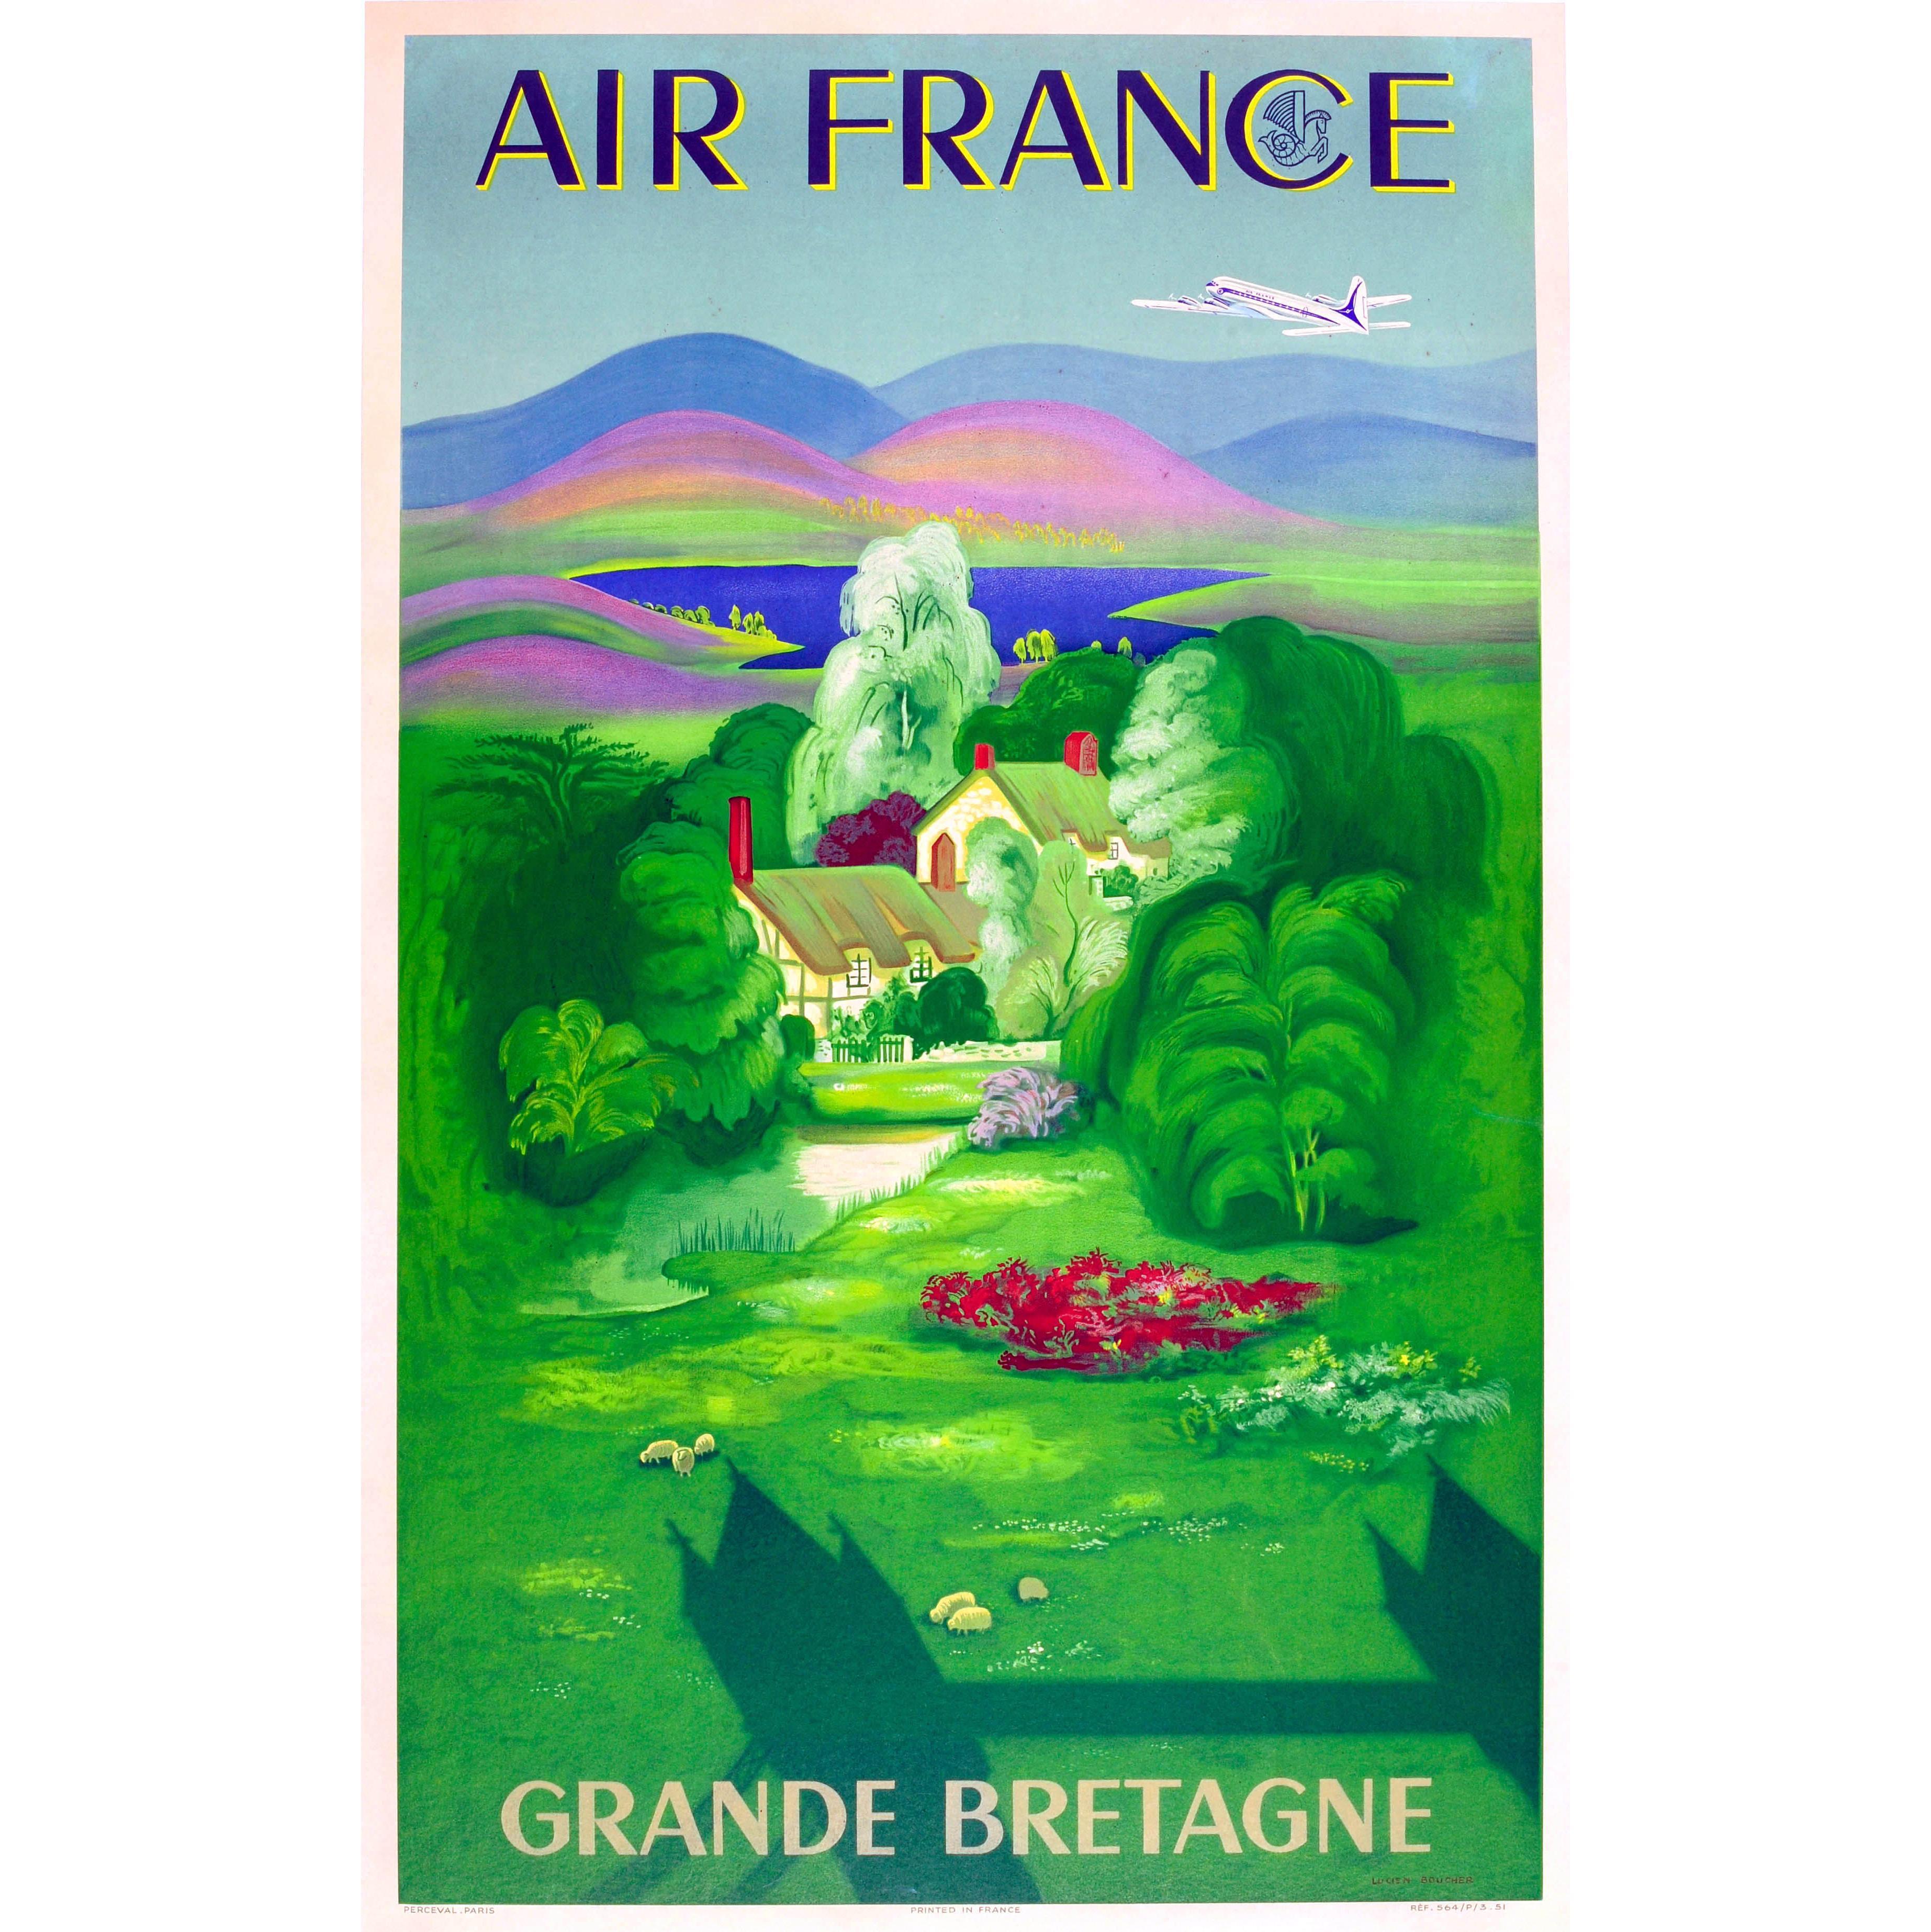 Original Vintage Air France Travel Poster For Grande Bretagne Great Britain (GB)